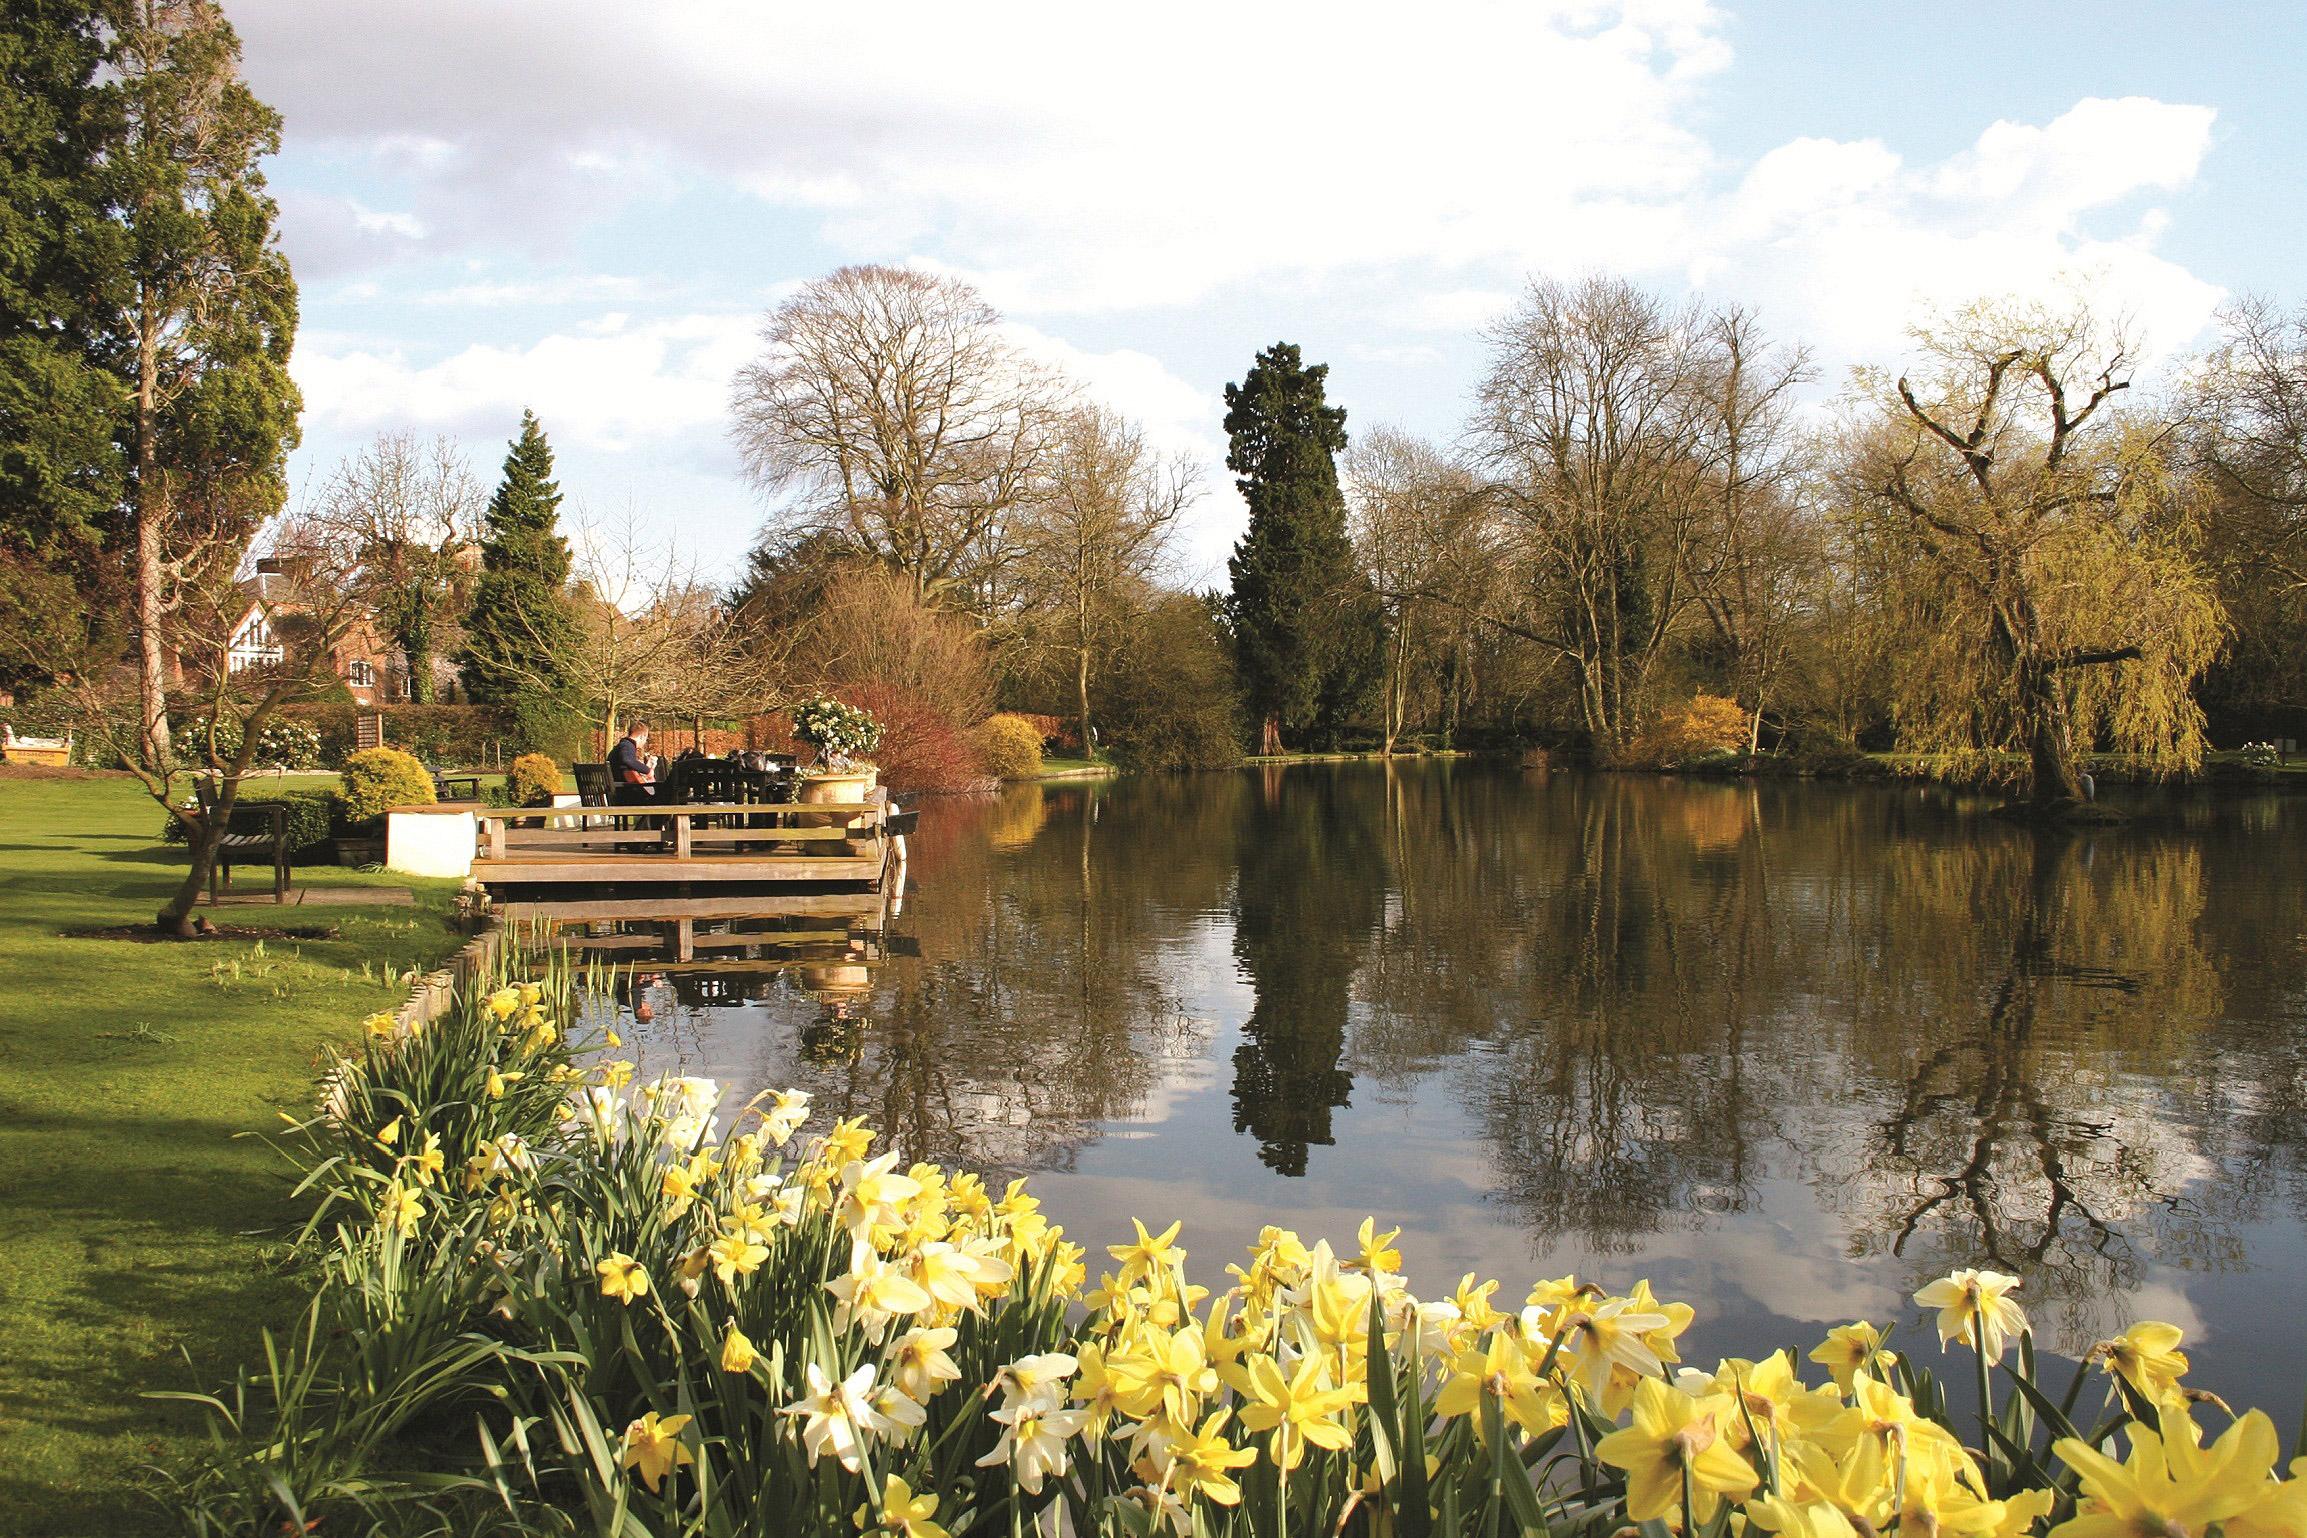 St Michael's Manor lake